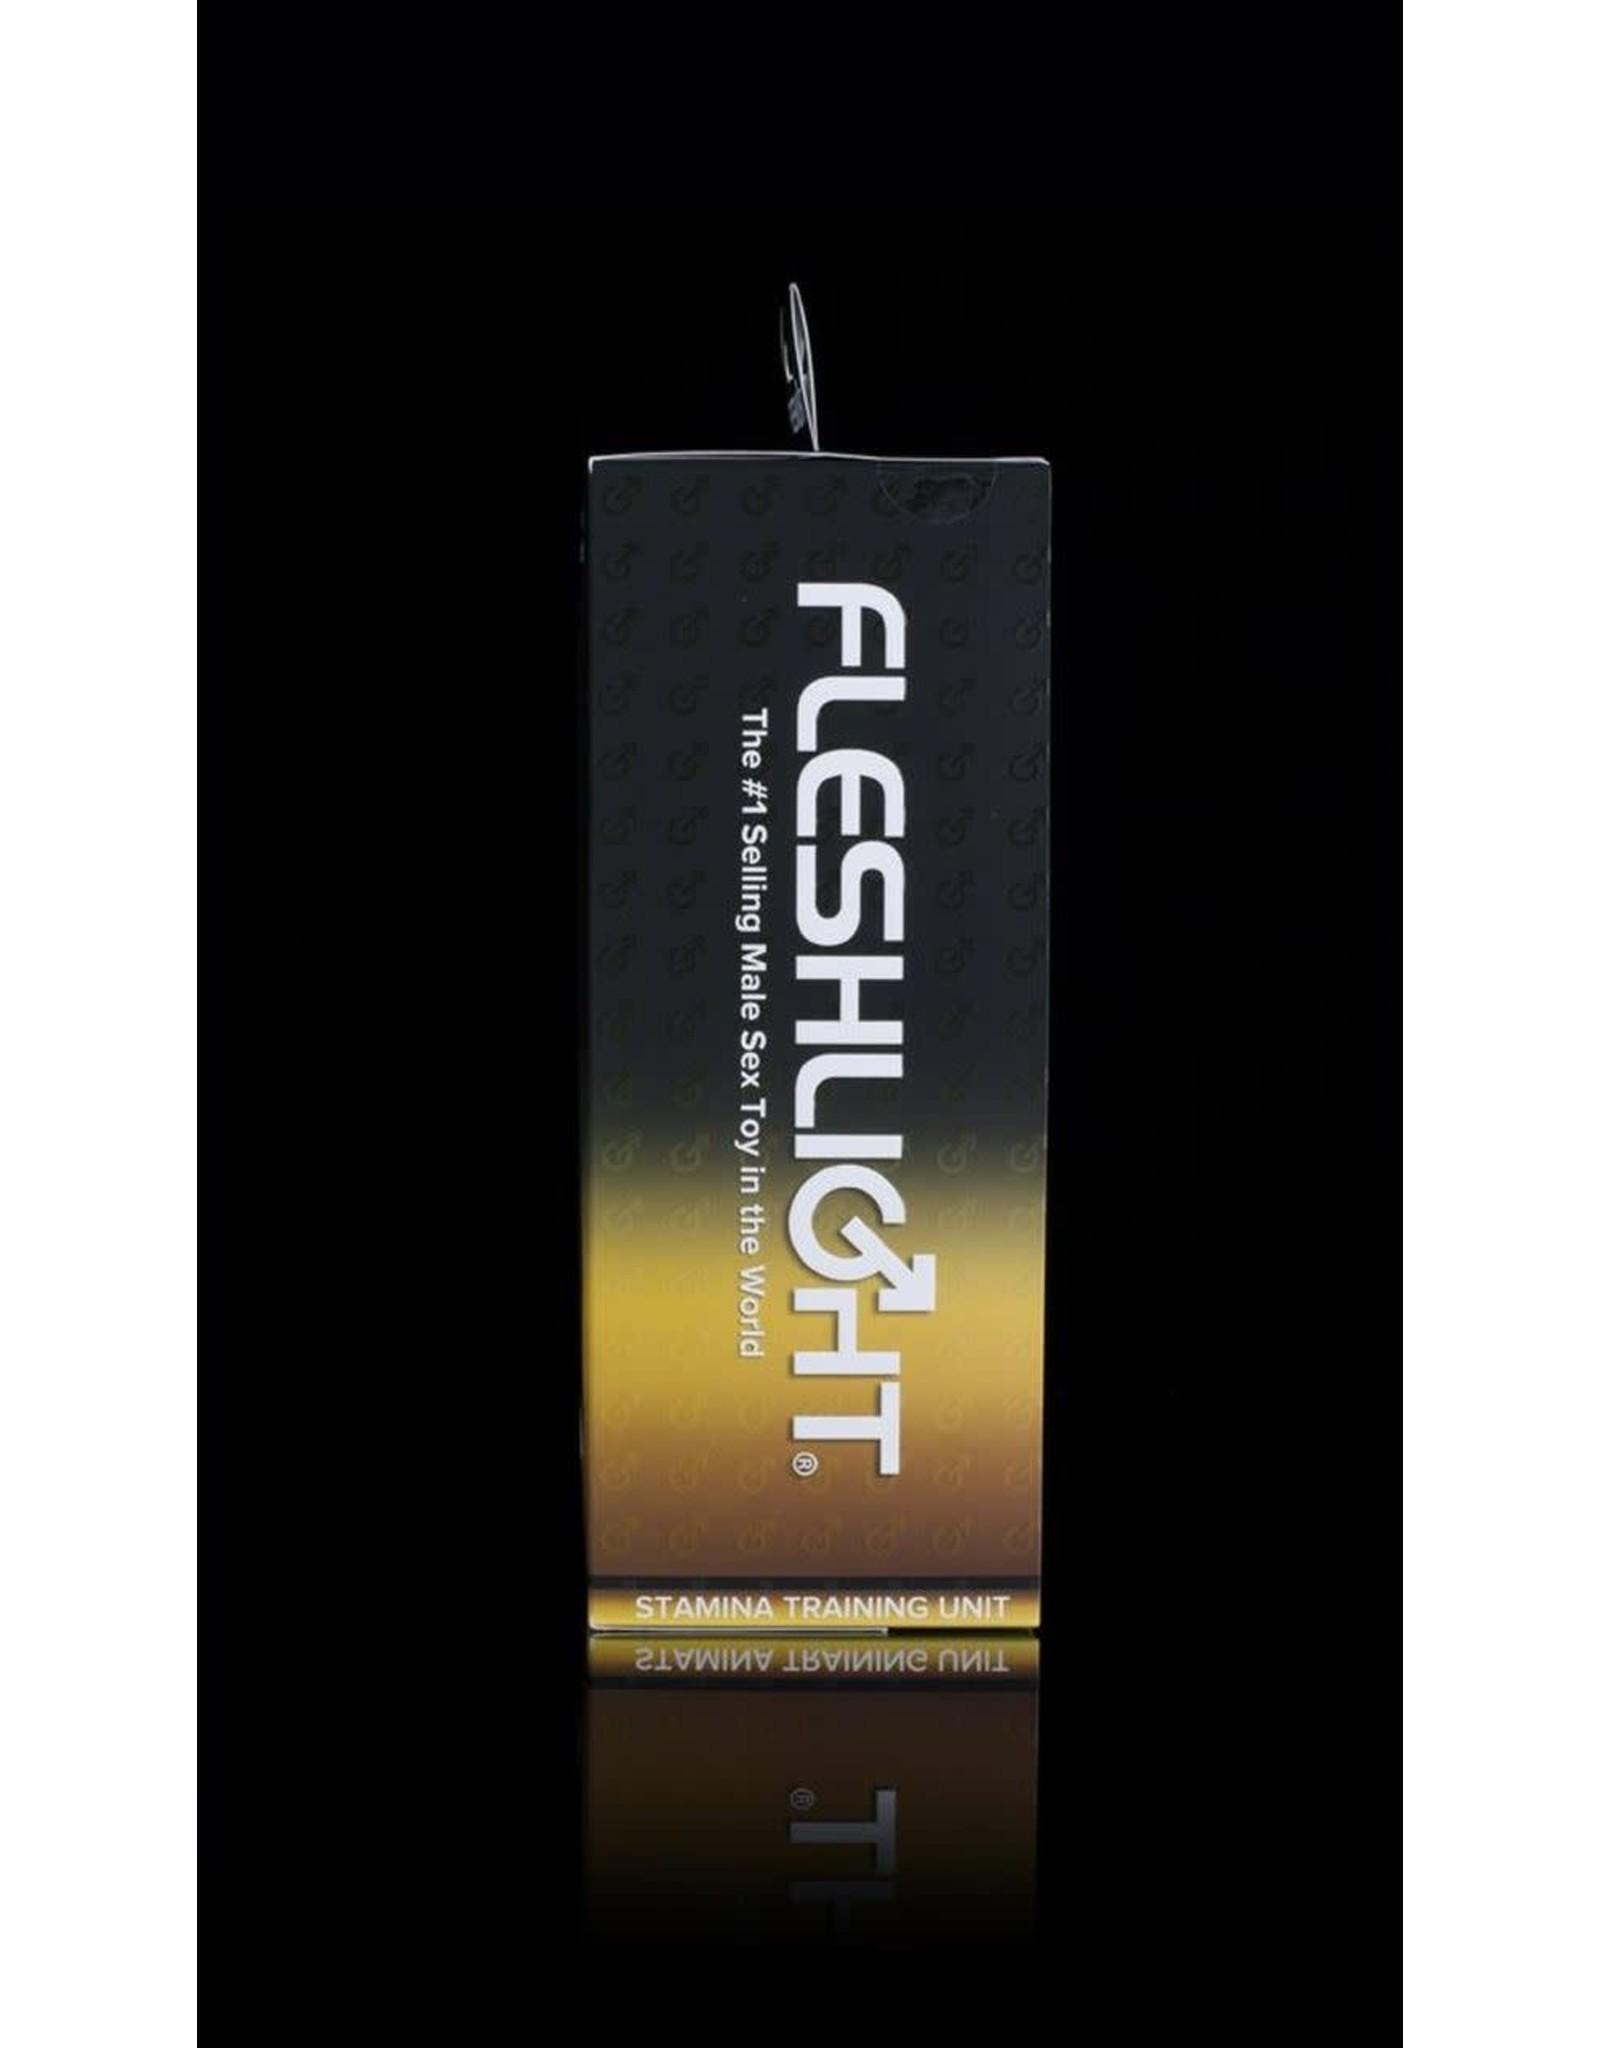 FLESH-LIGHT FLESHLIGHT - PINK LADY S.T.U. STAMINA TRAINING UNIT